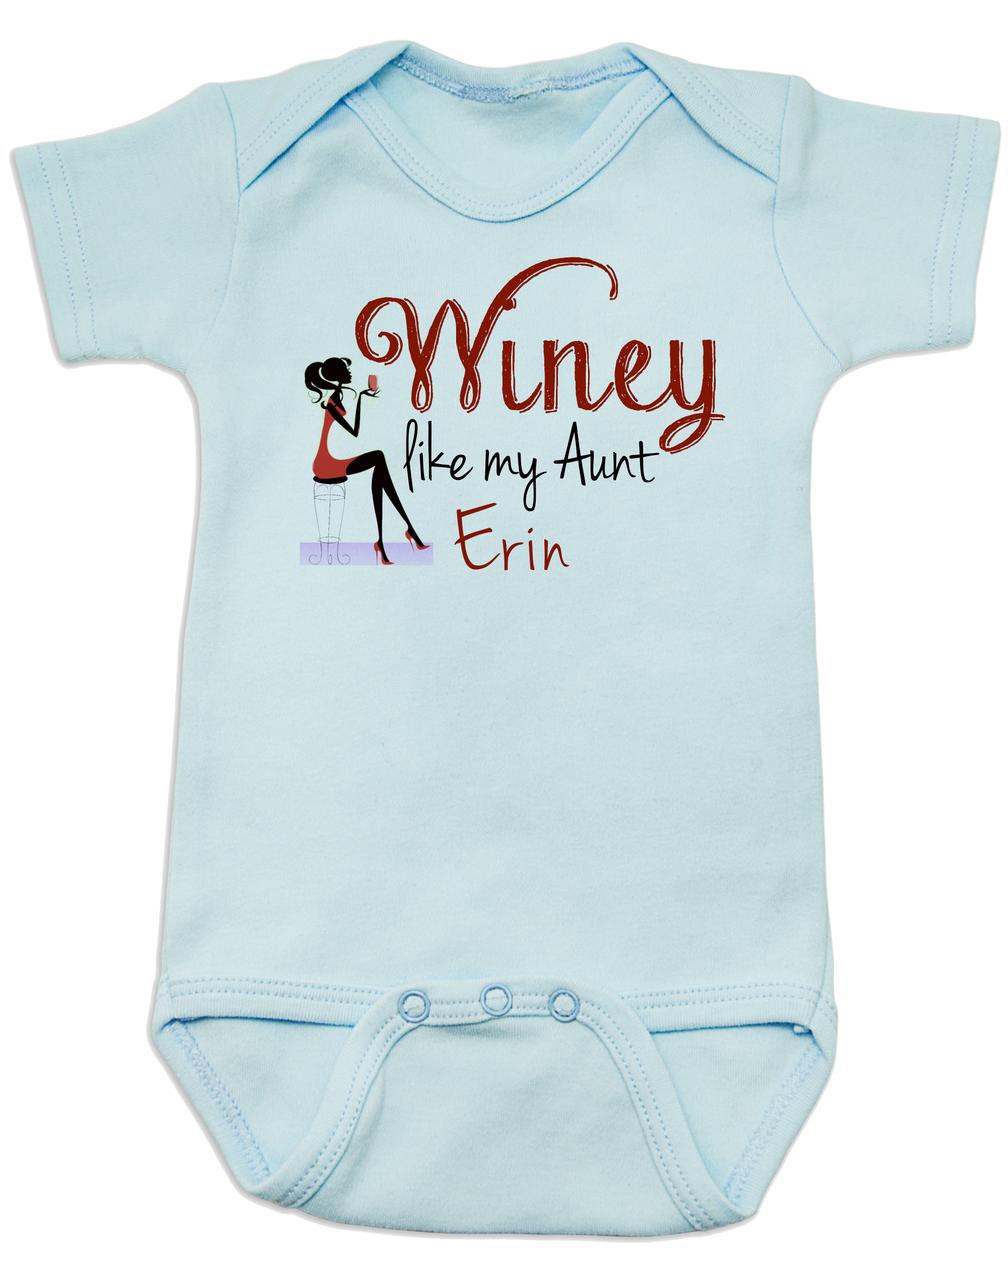 If you think Im cute Auntpersonalized custom  funny cute infant bodysuit unisex